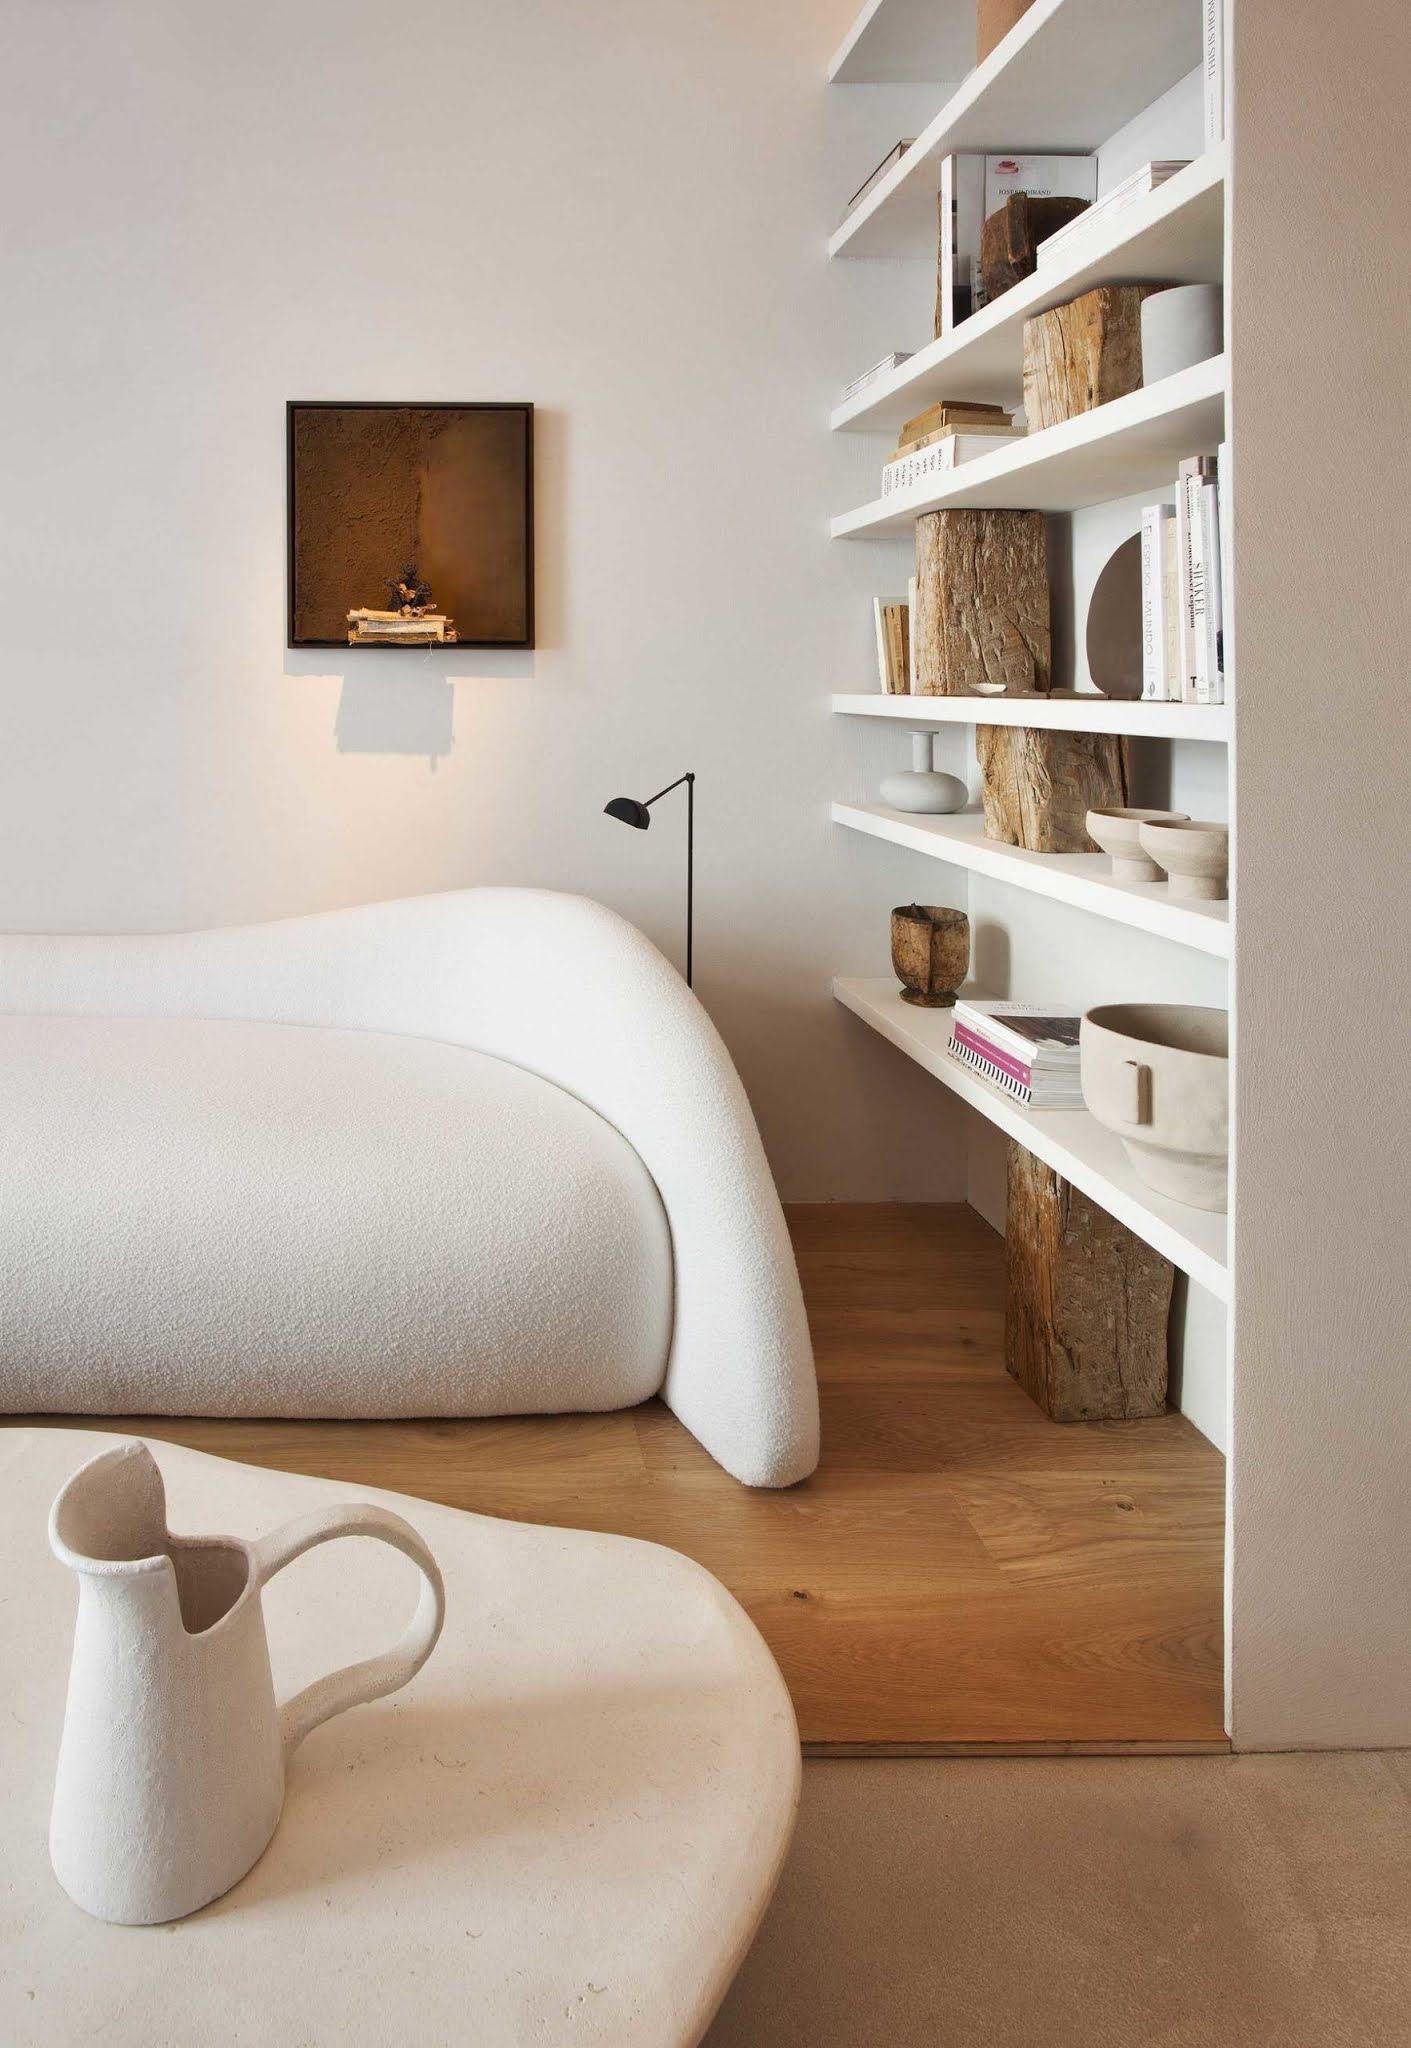 ilaria fatone - A Comforting Wabi-Sabi Space - sofa nook